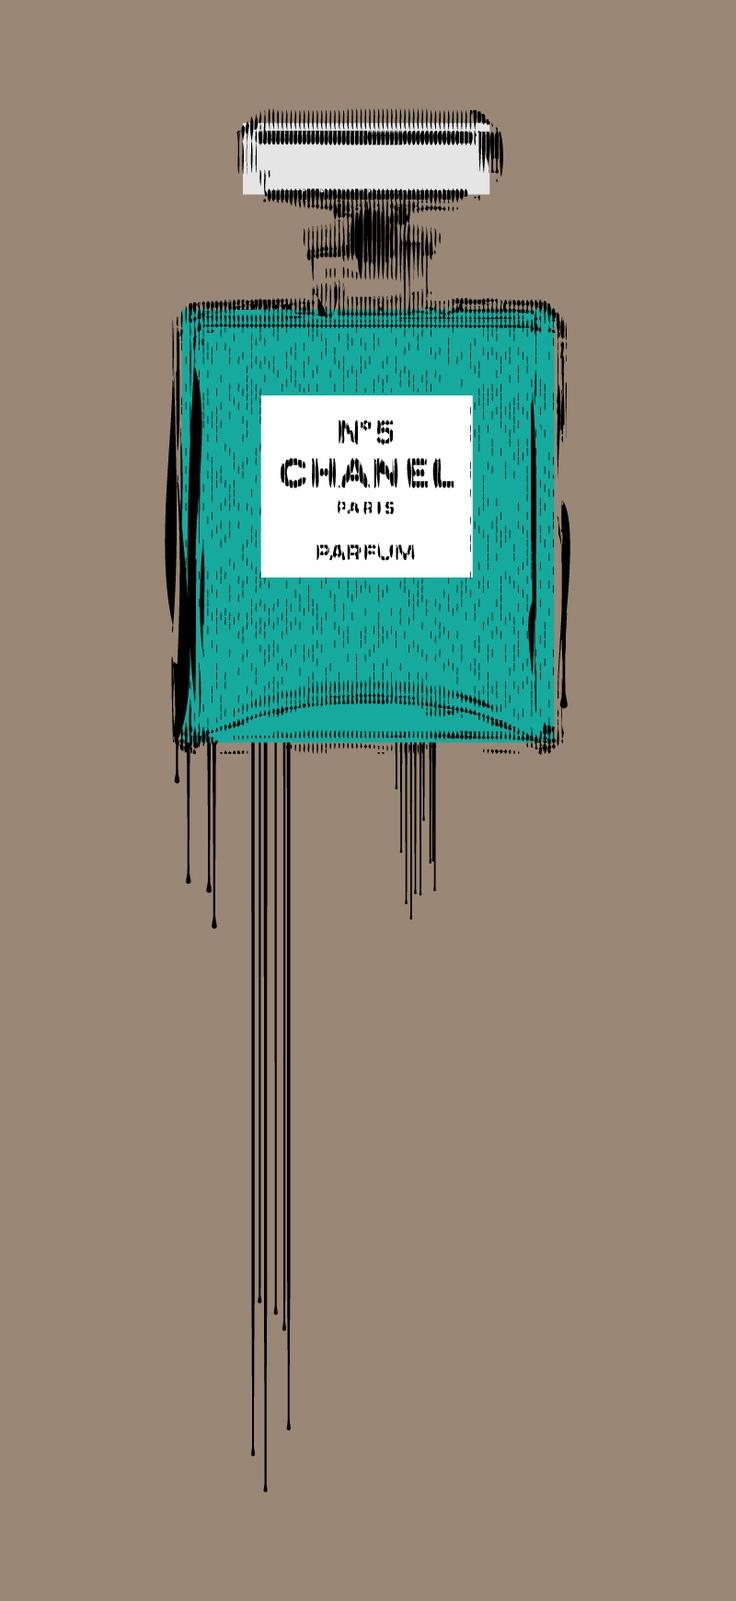 #chanel #nr5 #5 #bottle #parfume #icon #dripping #drip #cocochanel  Coco Chanel dripping bottle of nr 5